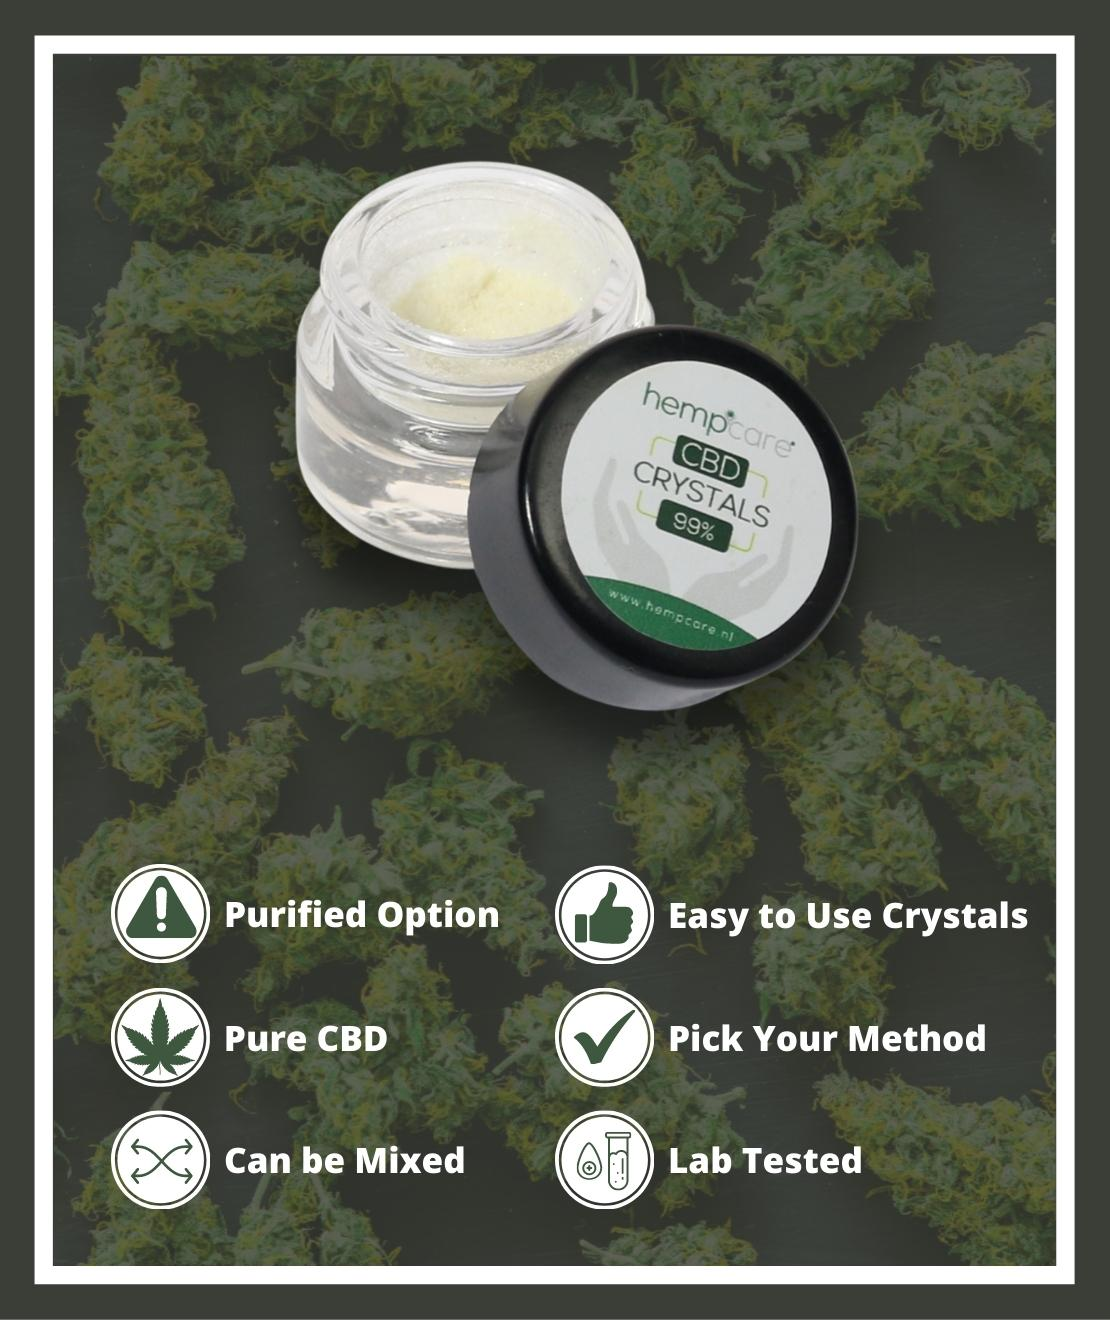 Hempcare Pure CBD Crystals